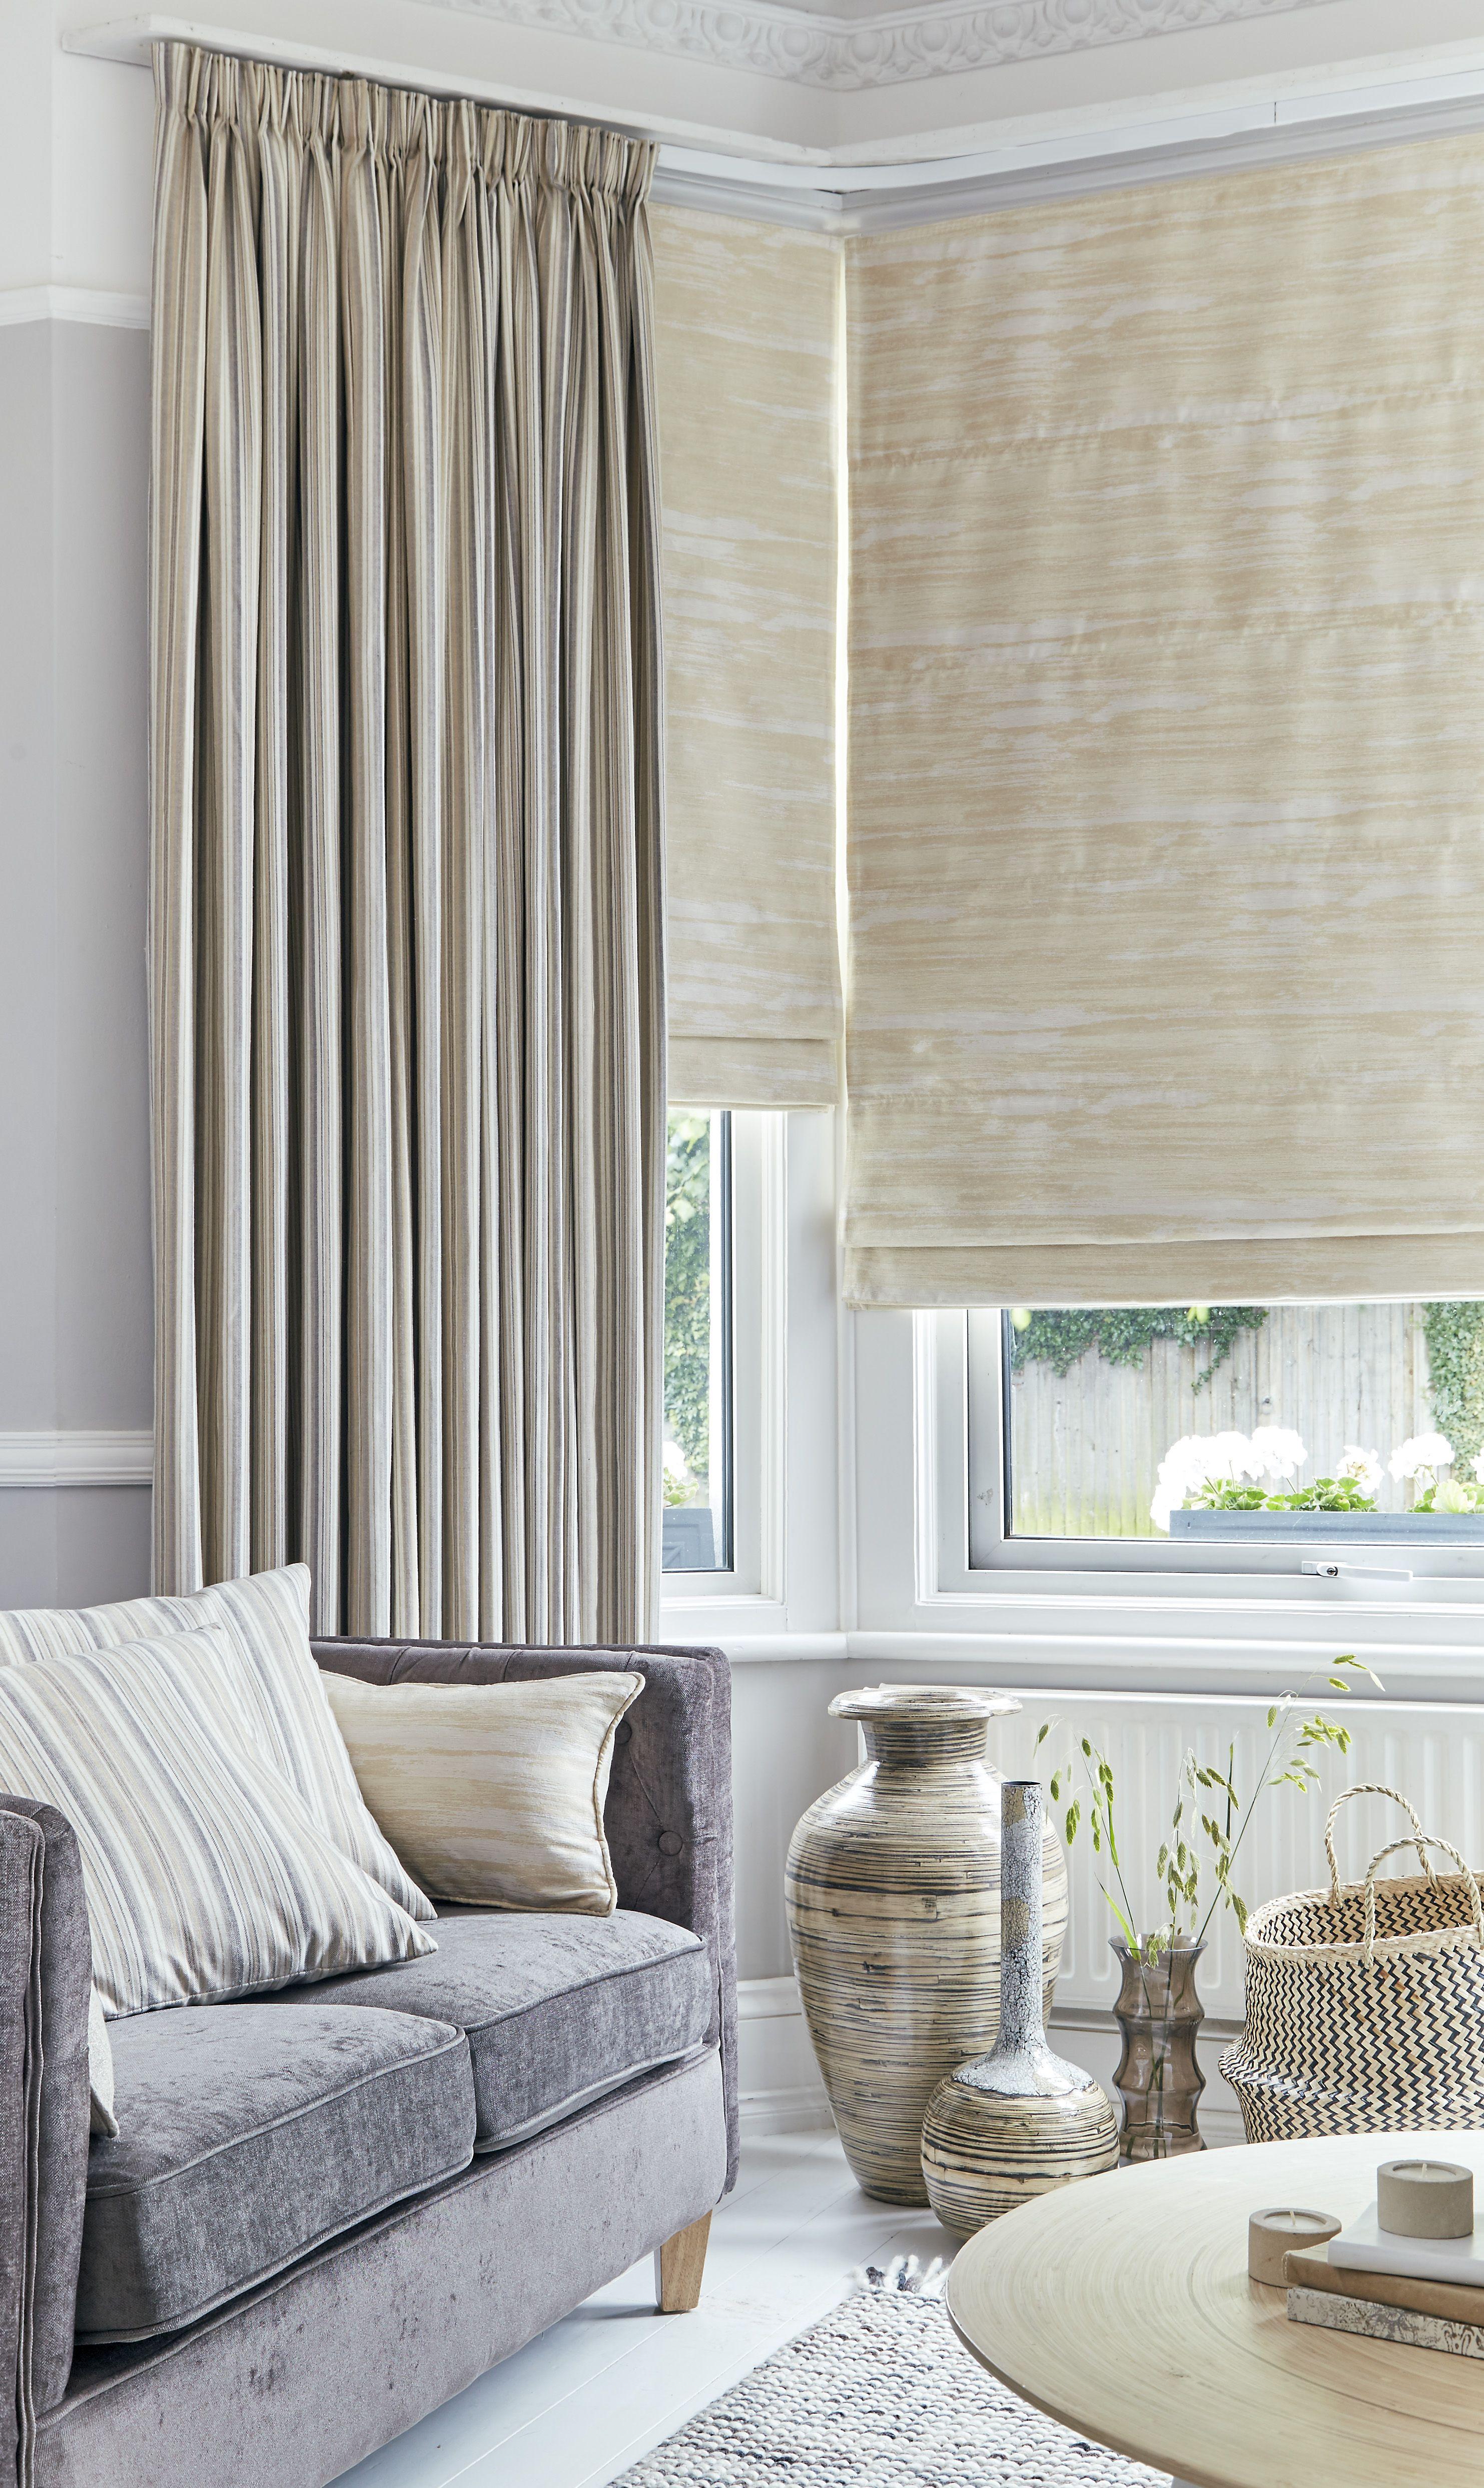 Roman Blinds Made To Measure Blackout Roman Blinds Yorkshire Cream Roman Blinds Neutral Living Room Bay Window Living Room #roman #blinds #living #room